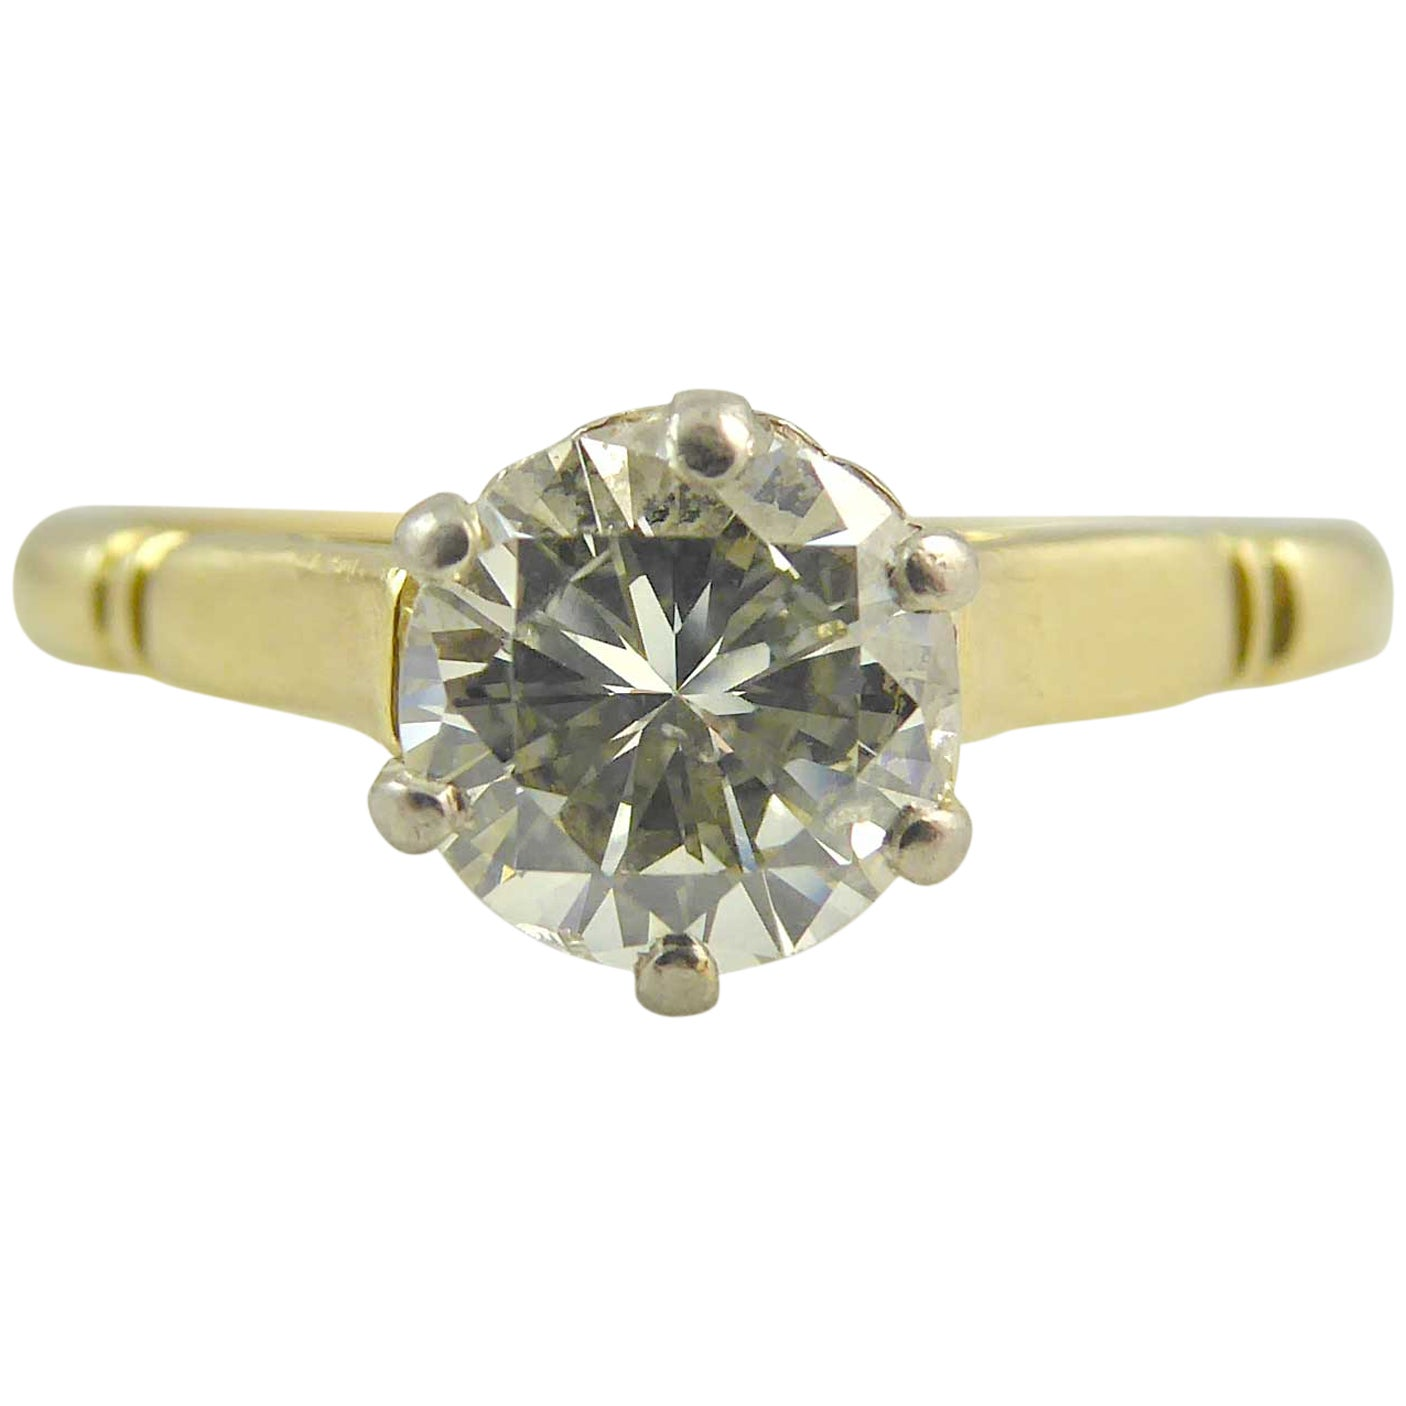 Vintage Solitaire Diamond Ring, 0.82 Carat, circa 1980s